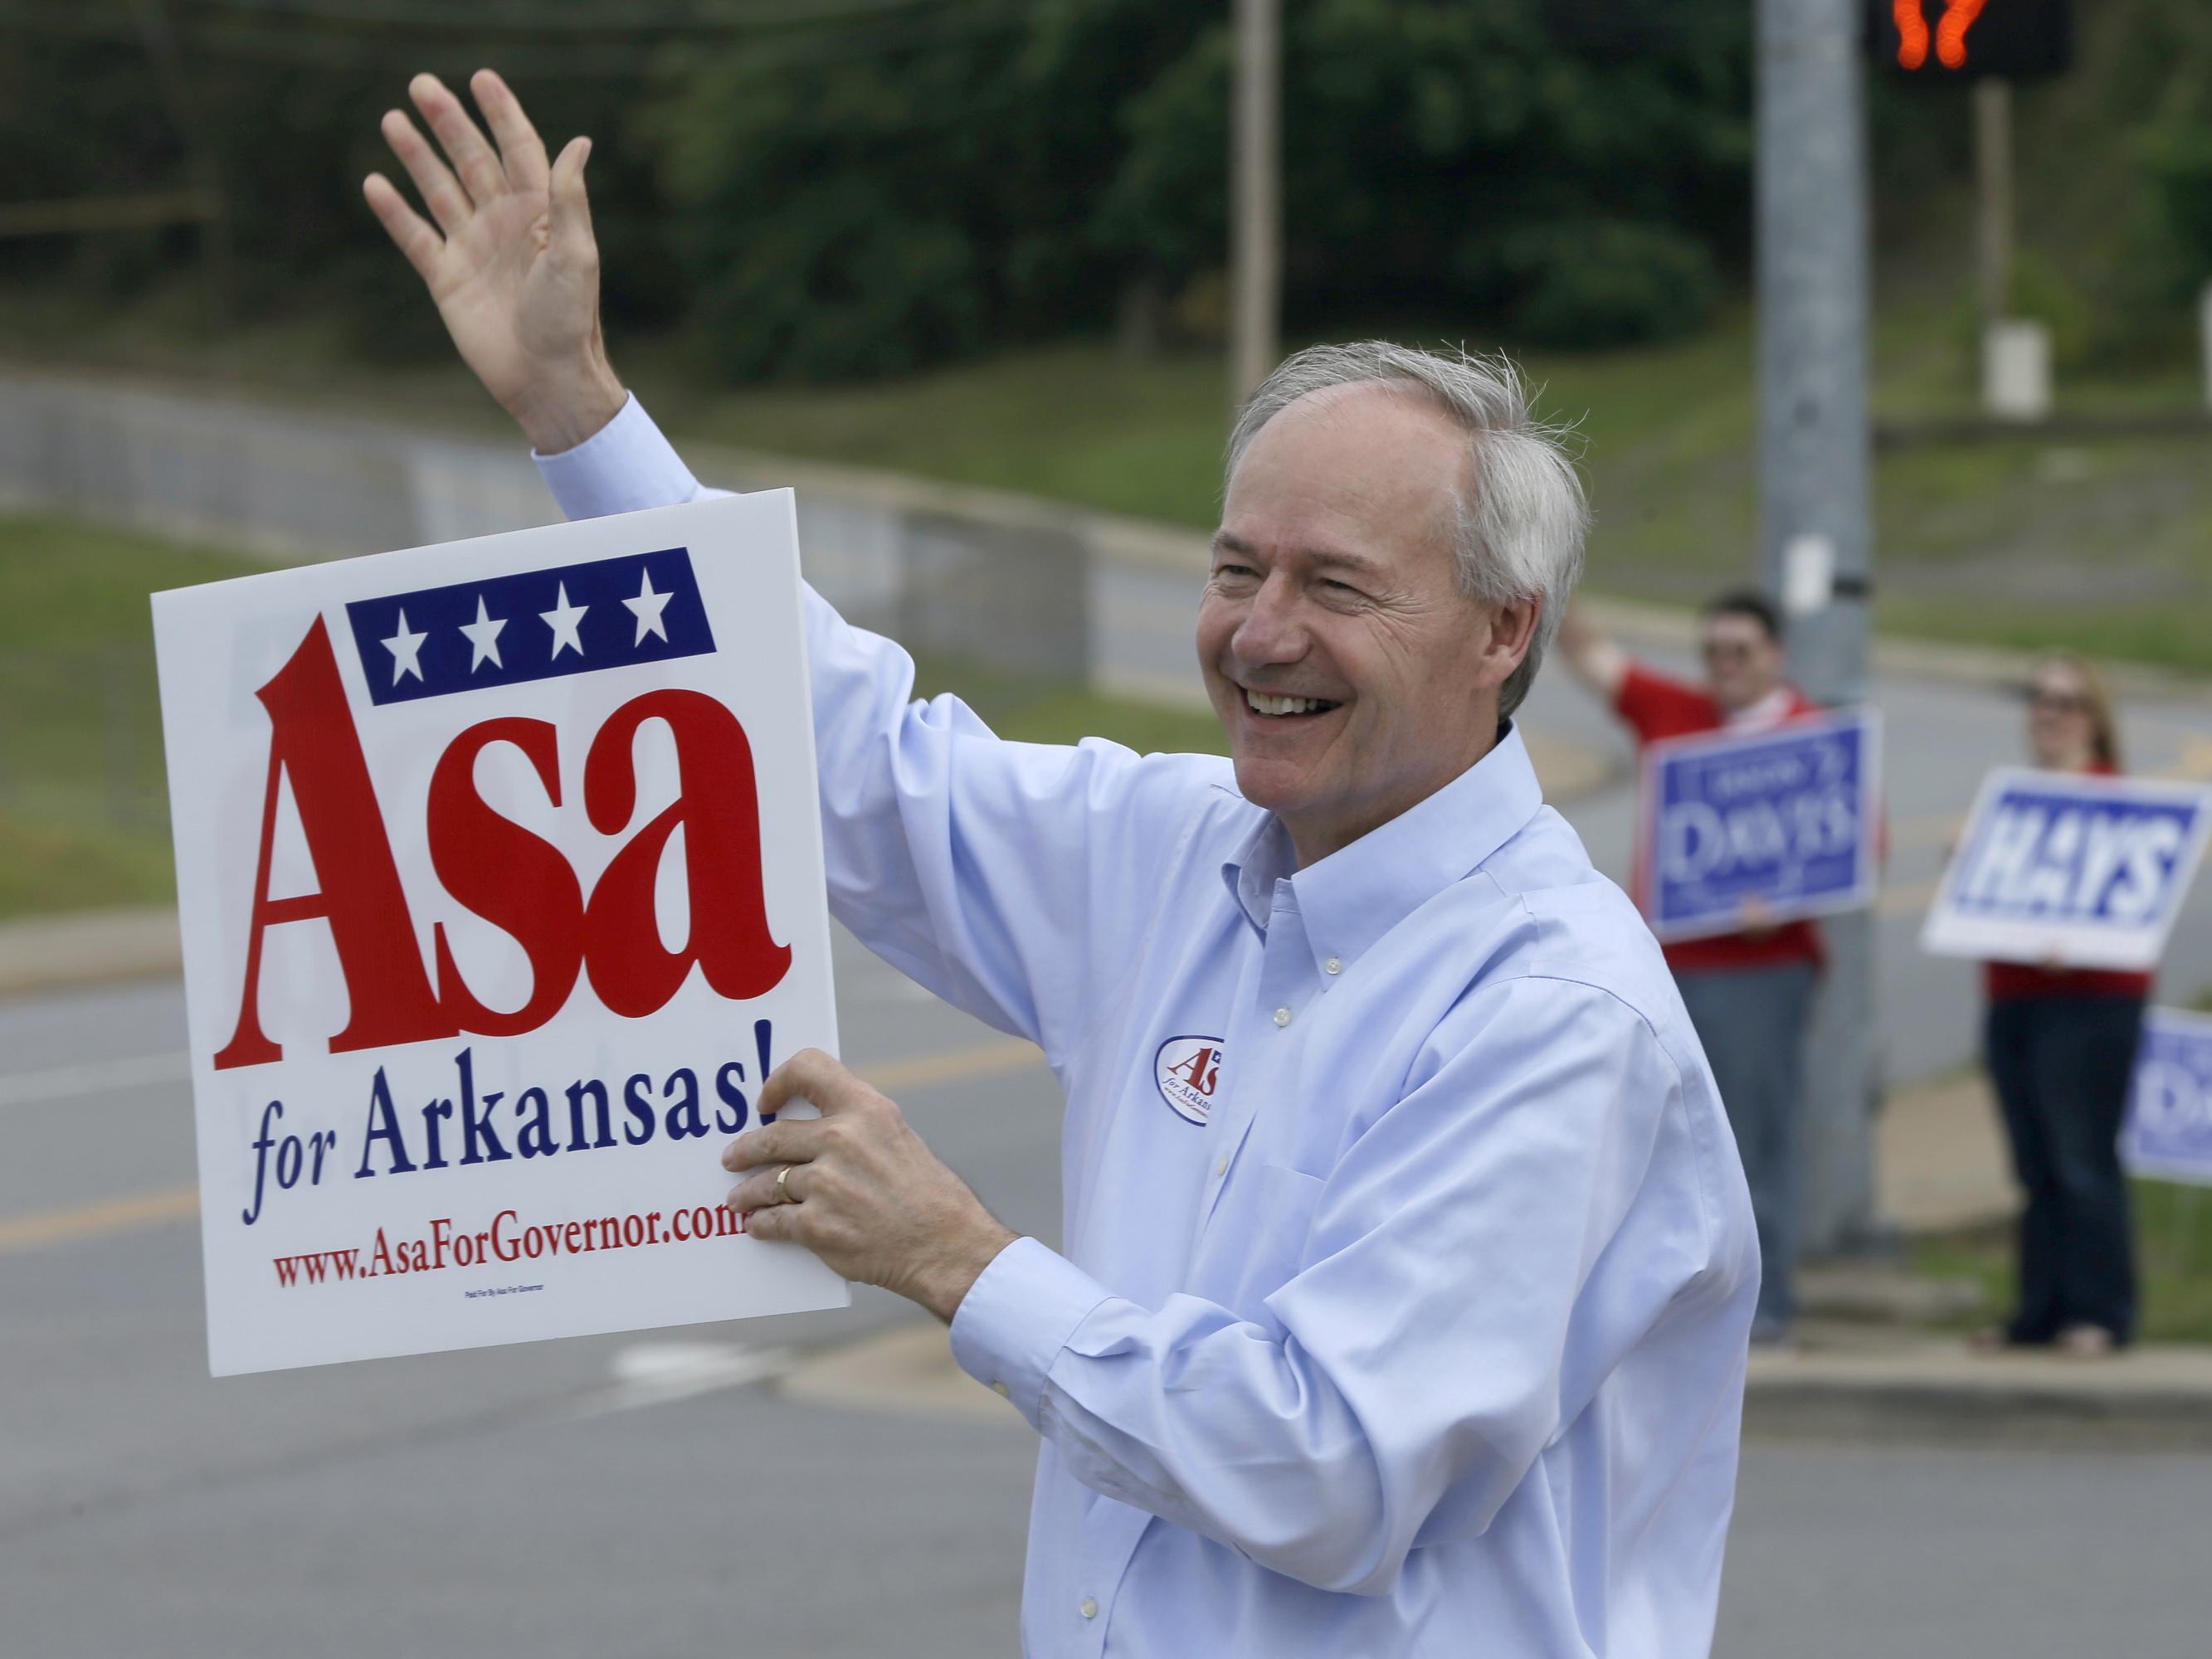 Arkansas Primary Governor Hutchinson